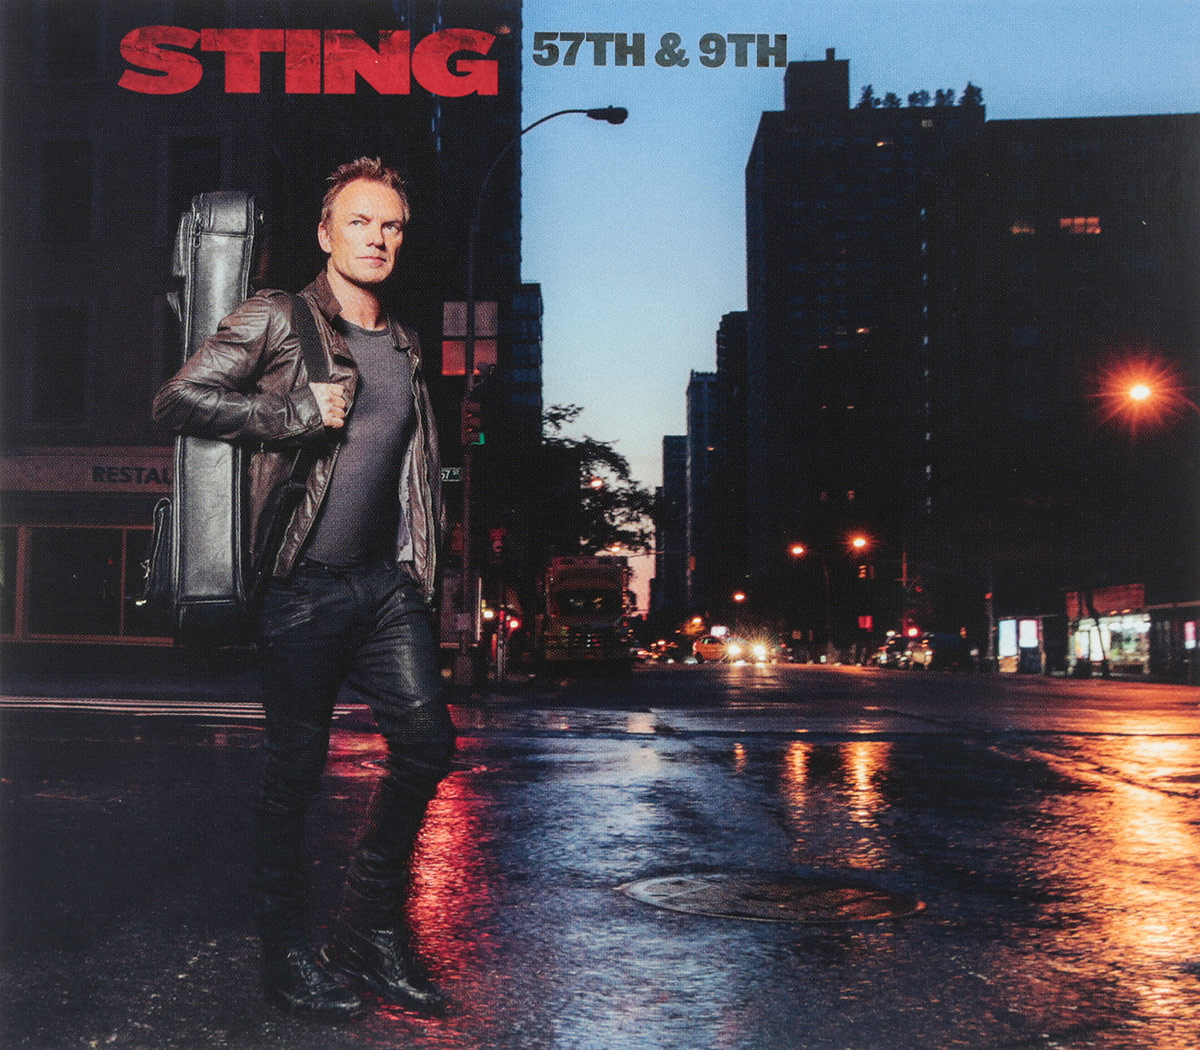 Стинг Sting. 57Th & 9Th стинг sting brand new day